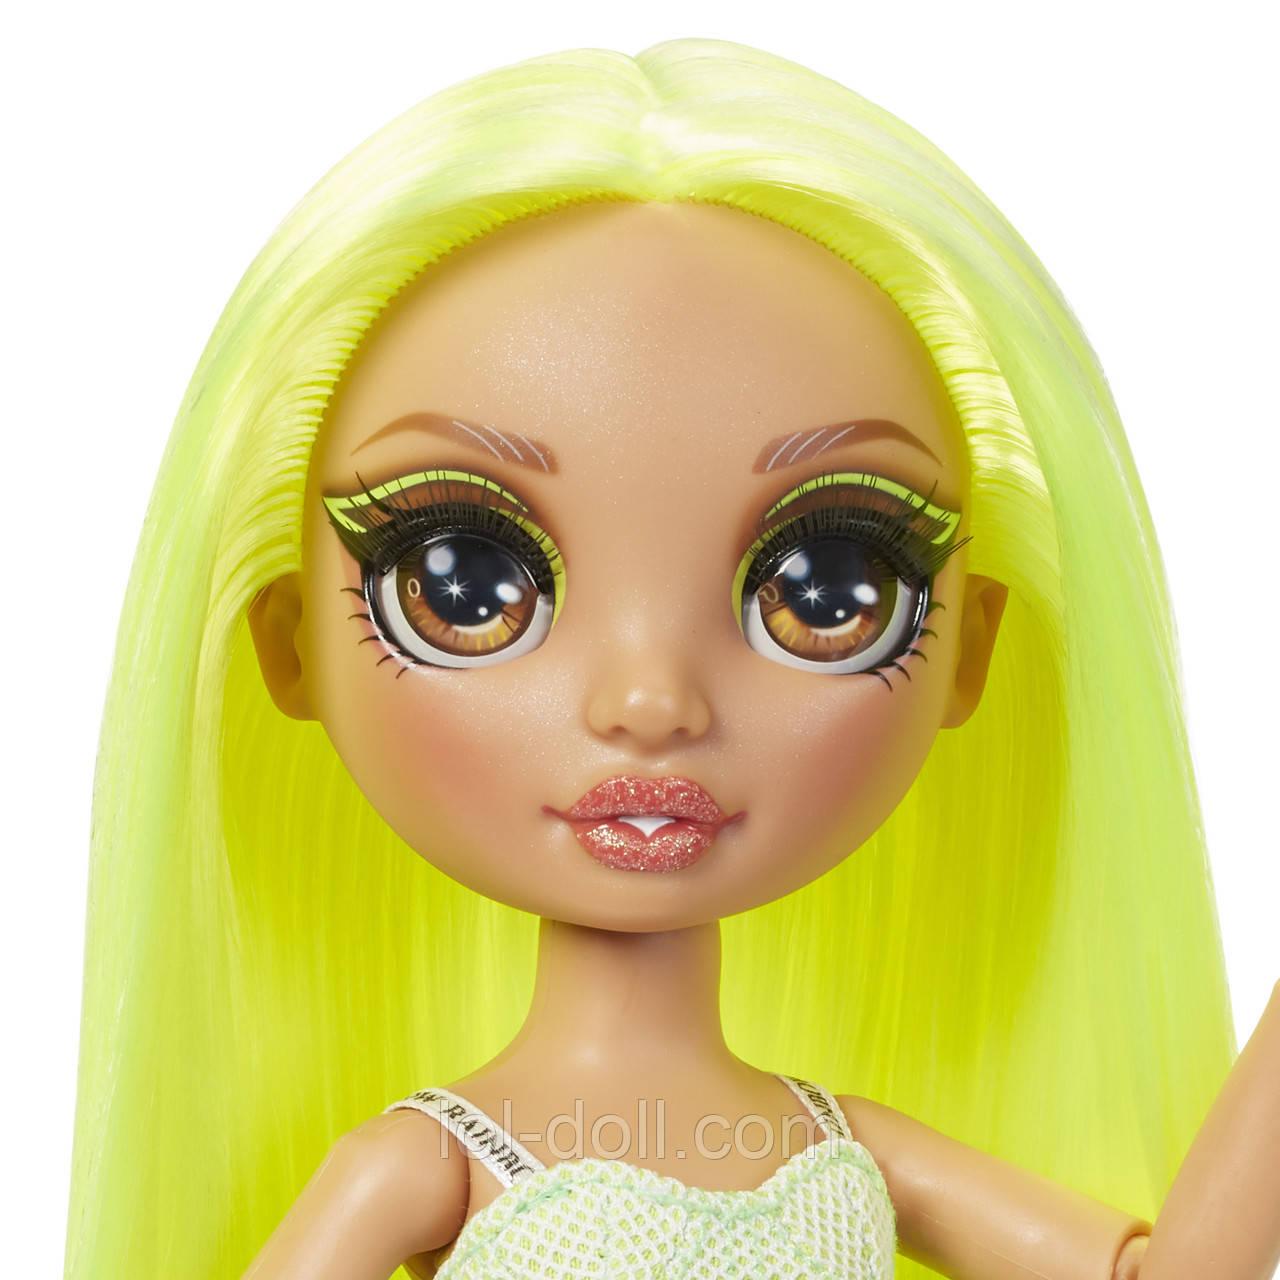 Кукла Рейнбоу Хай серия 2 Карма Никольс Rainbow High S2 Karma Nichols Fashion Doll